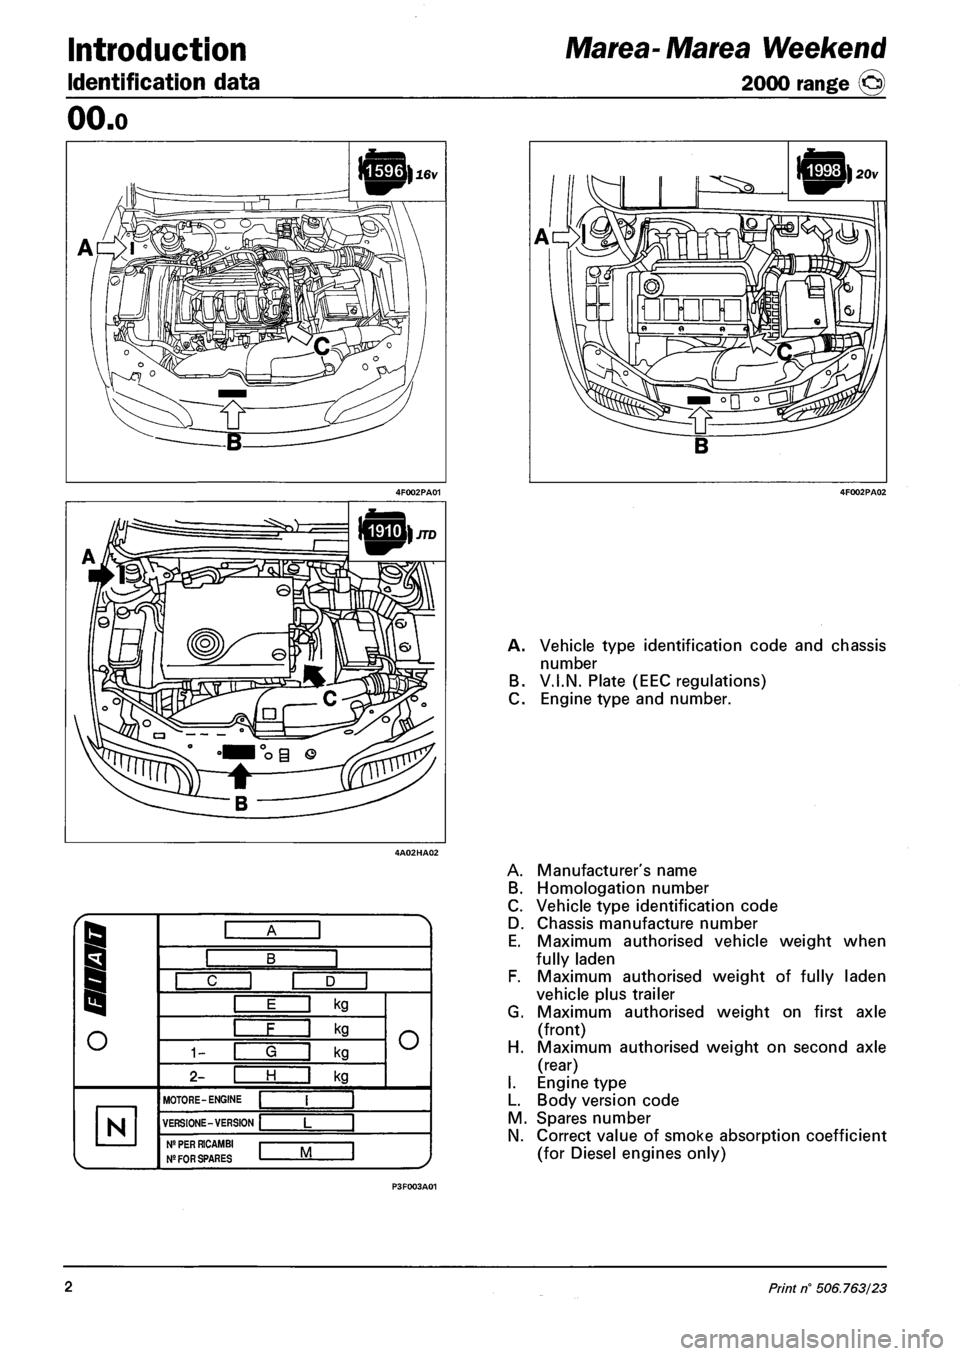 FIAT MAREA 2001 1.G Workshop Manual (330 Pages)